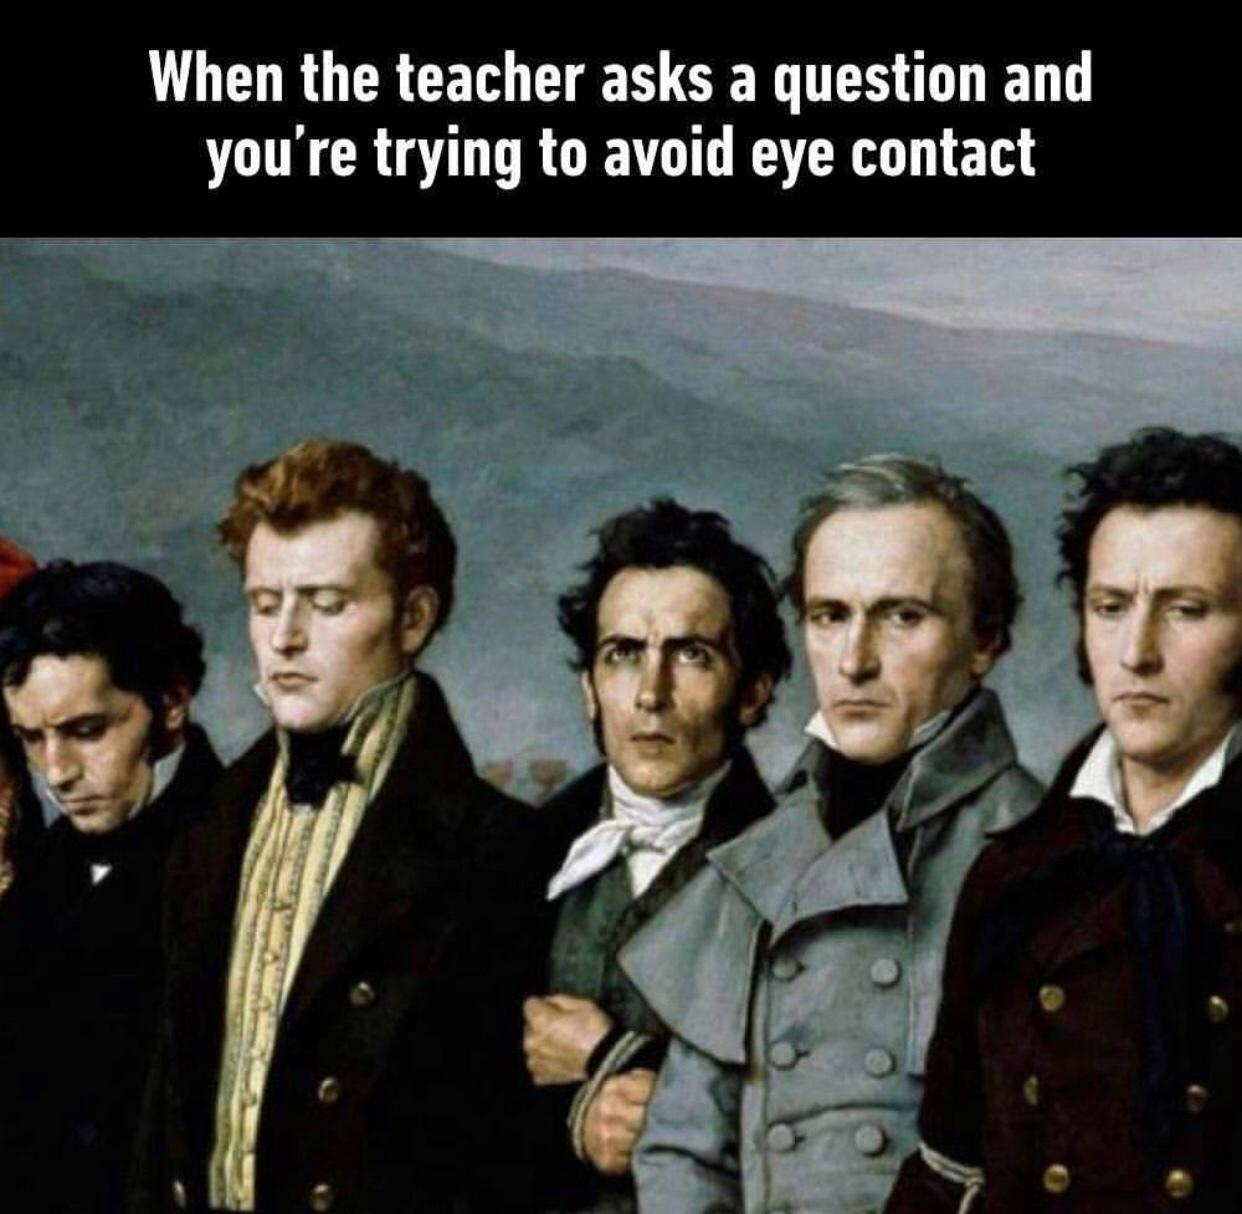 no eye contact no question - meme